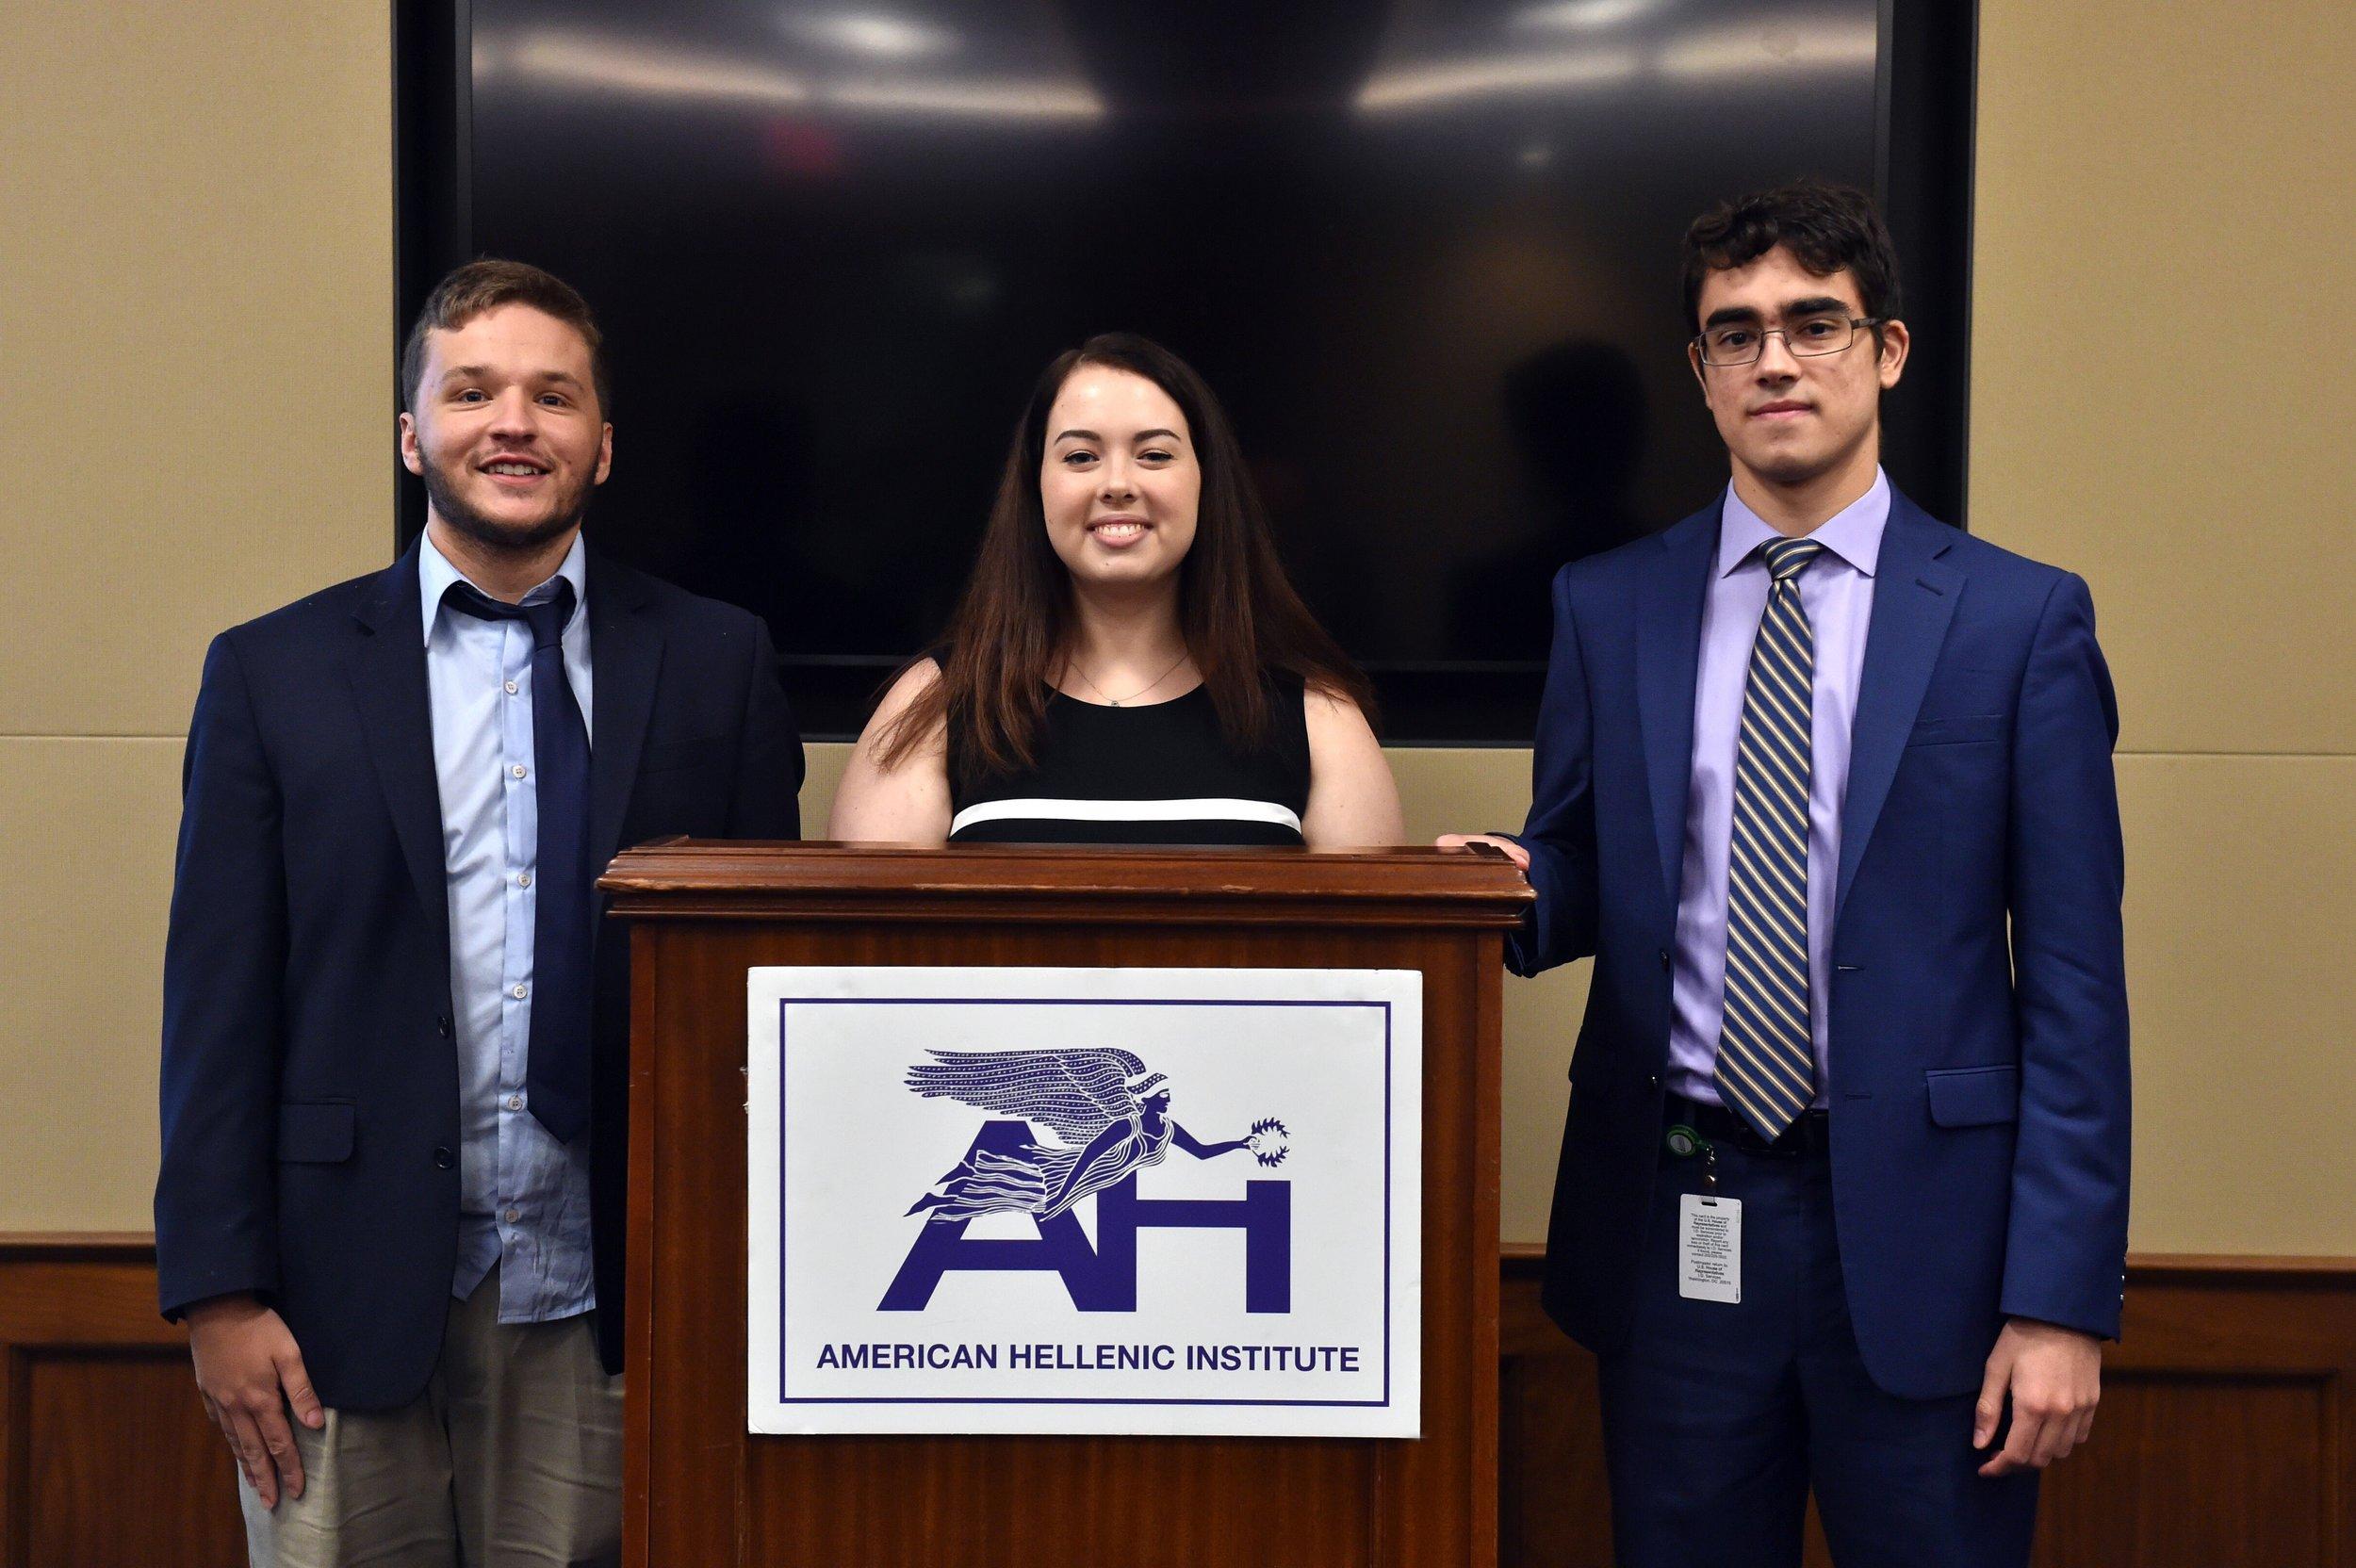 (L to R) AHI summer 2019 interns: Konstantinos Tsarouchis, Hannah Henick and Adonis Caramintzos.